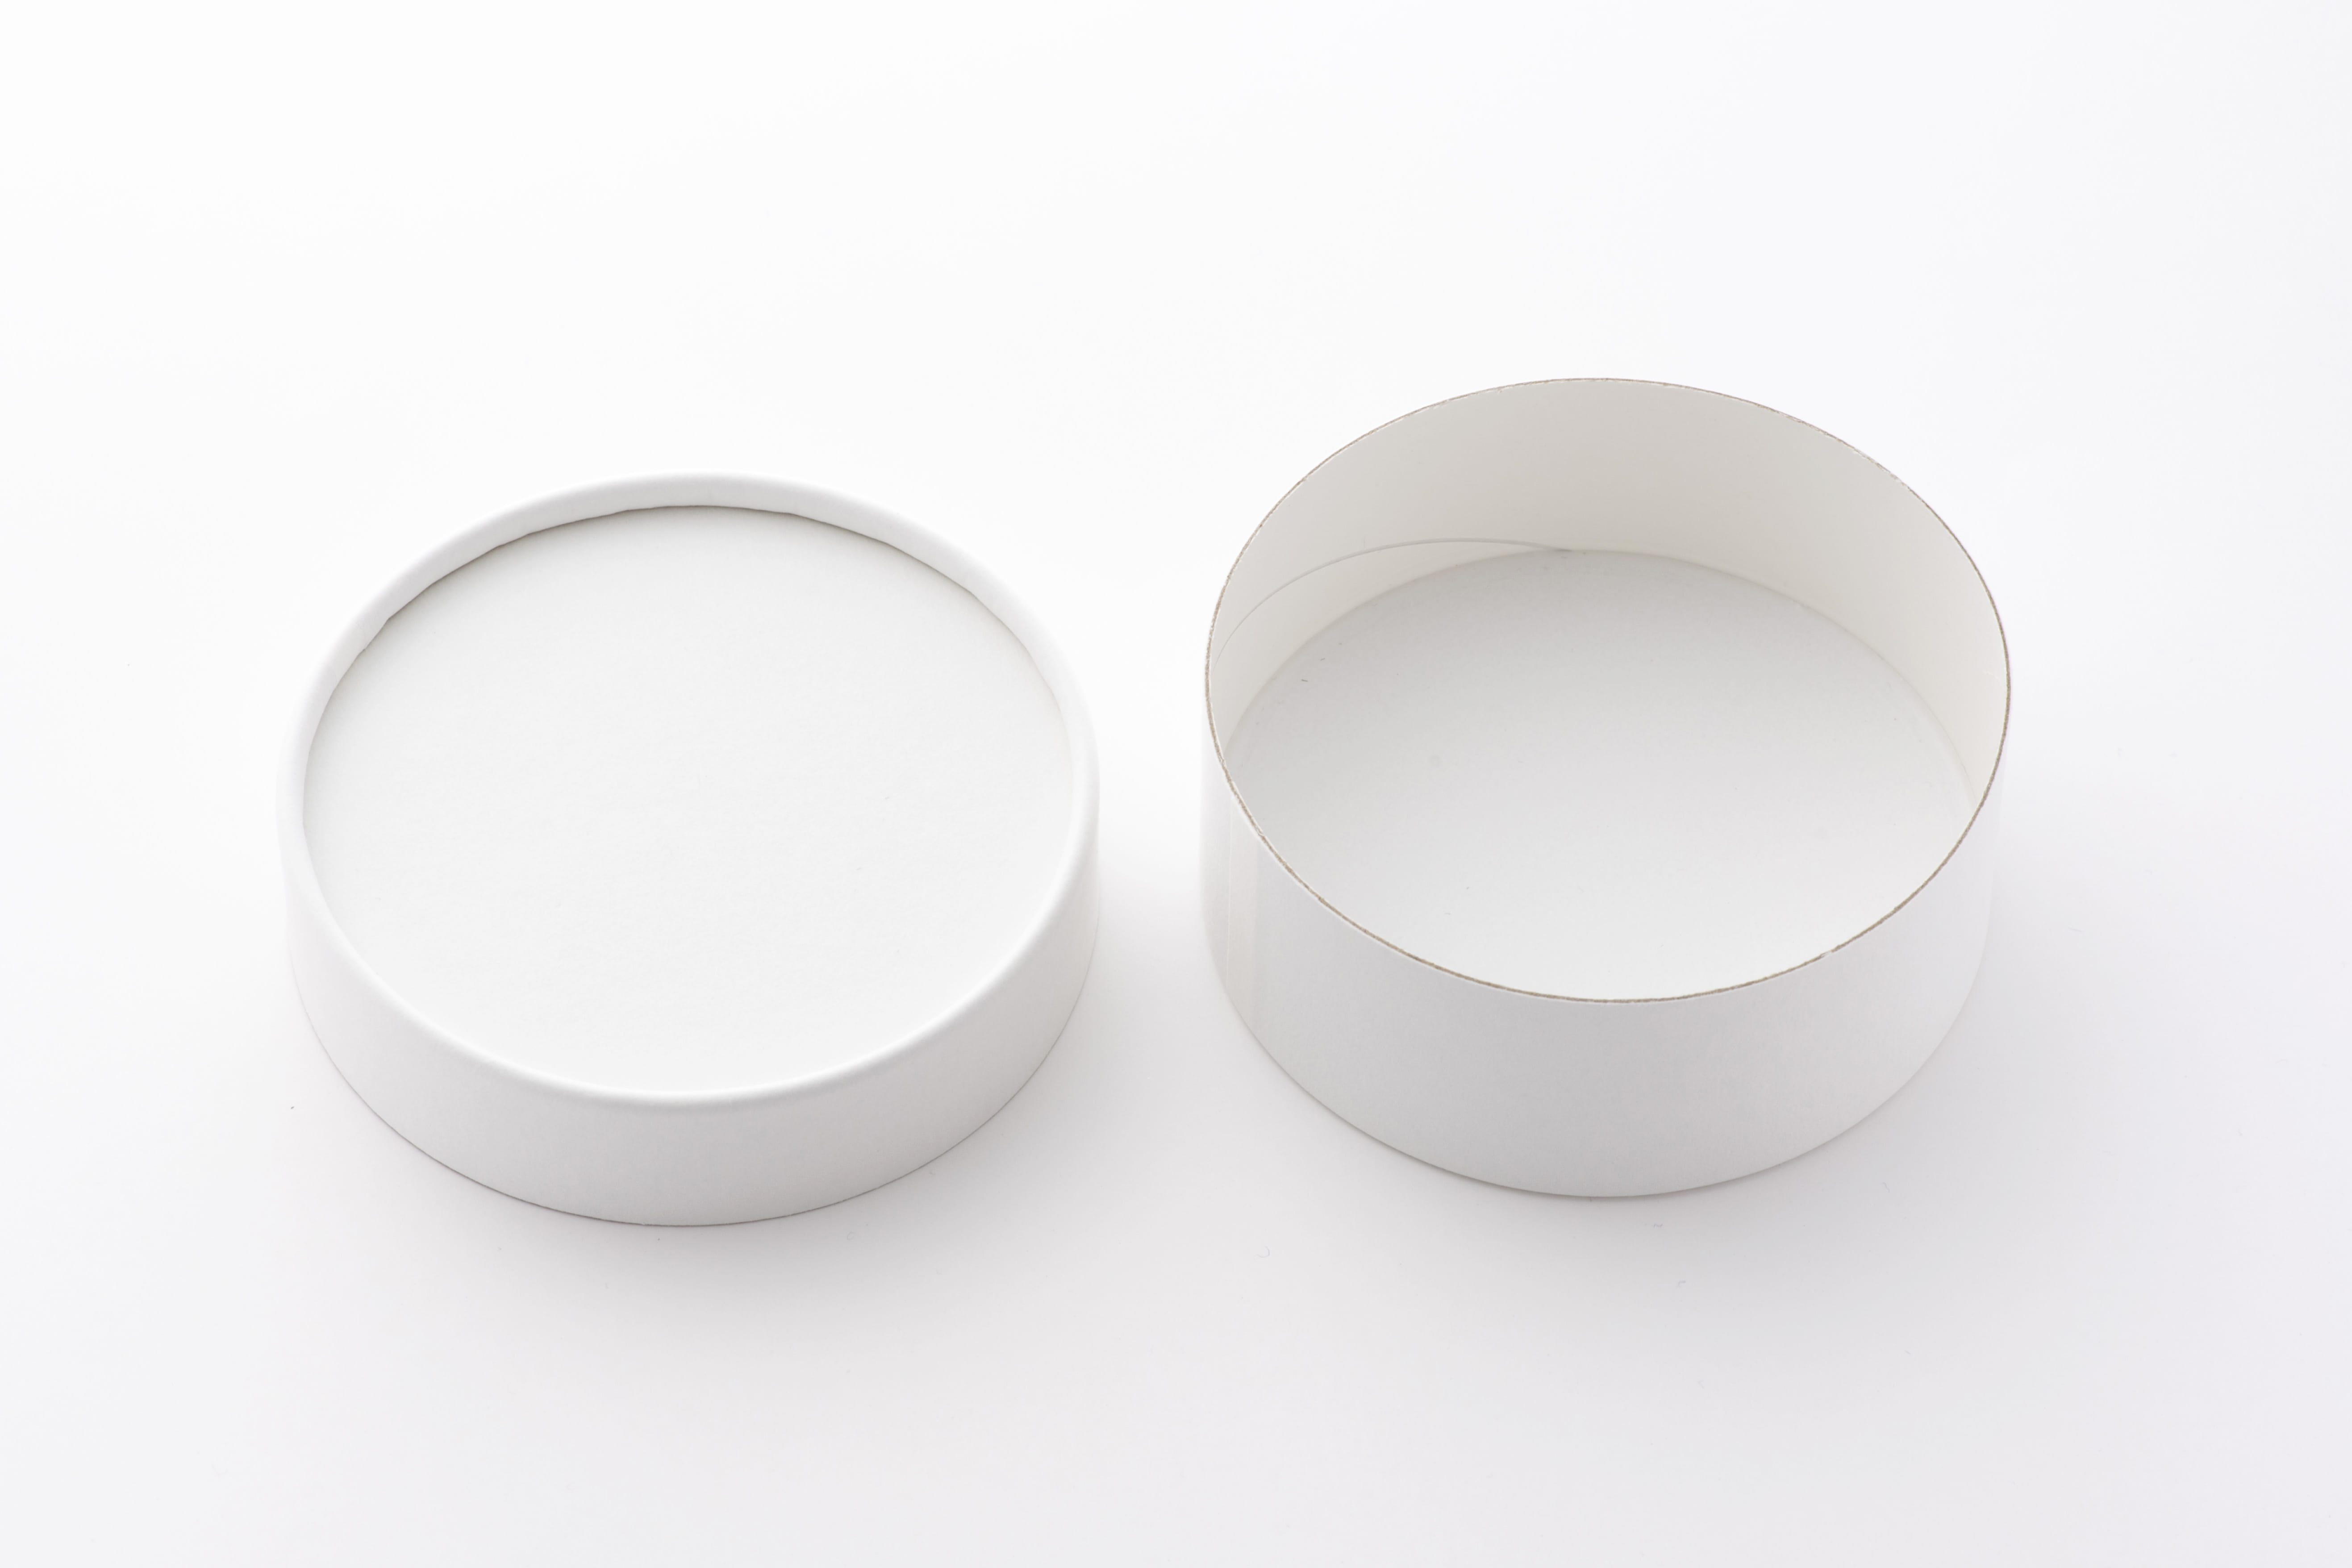 roundbox-muji